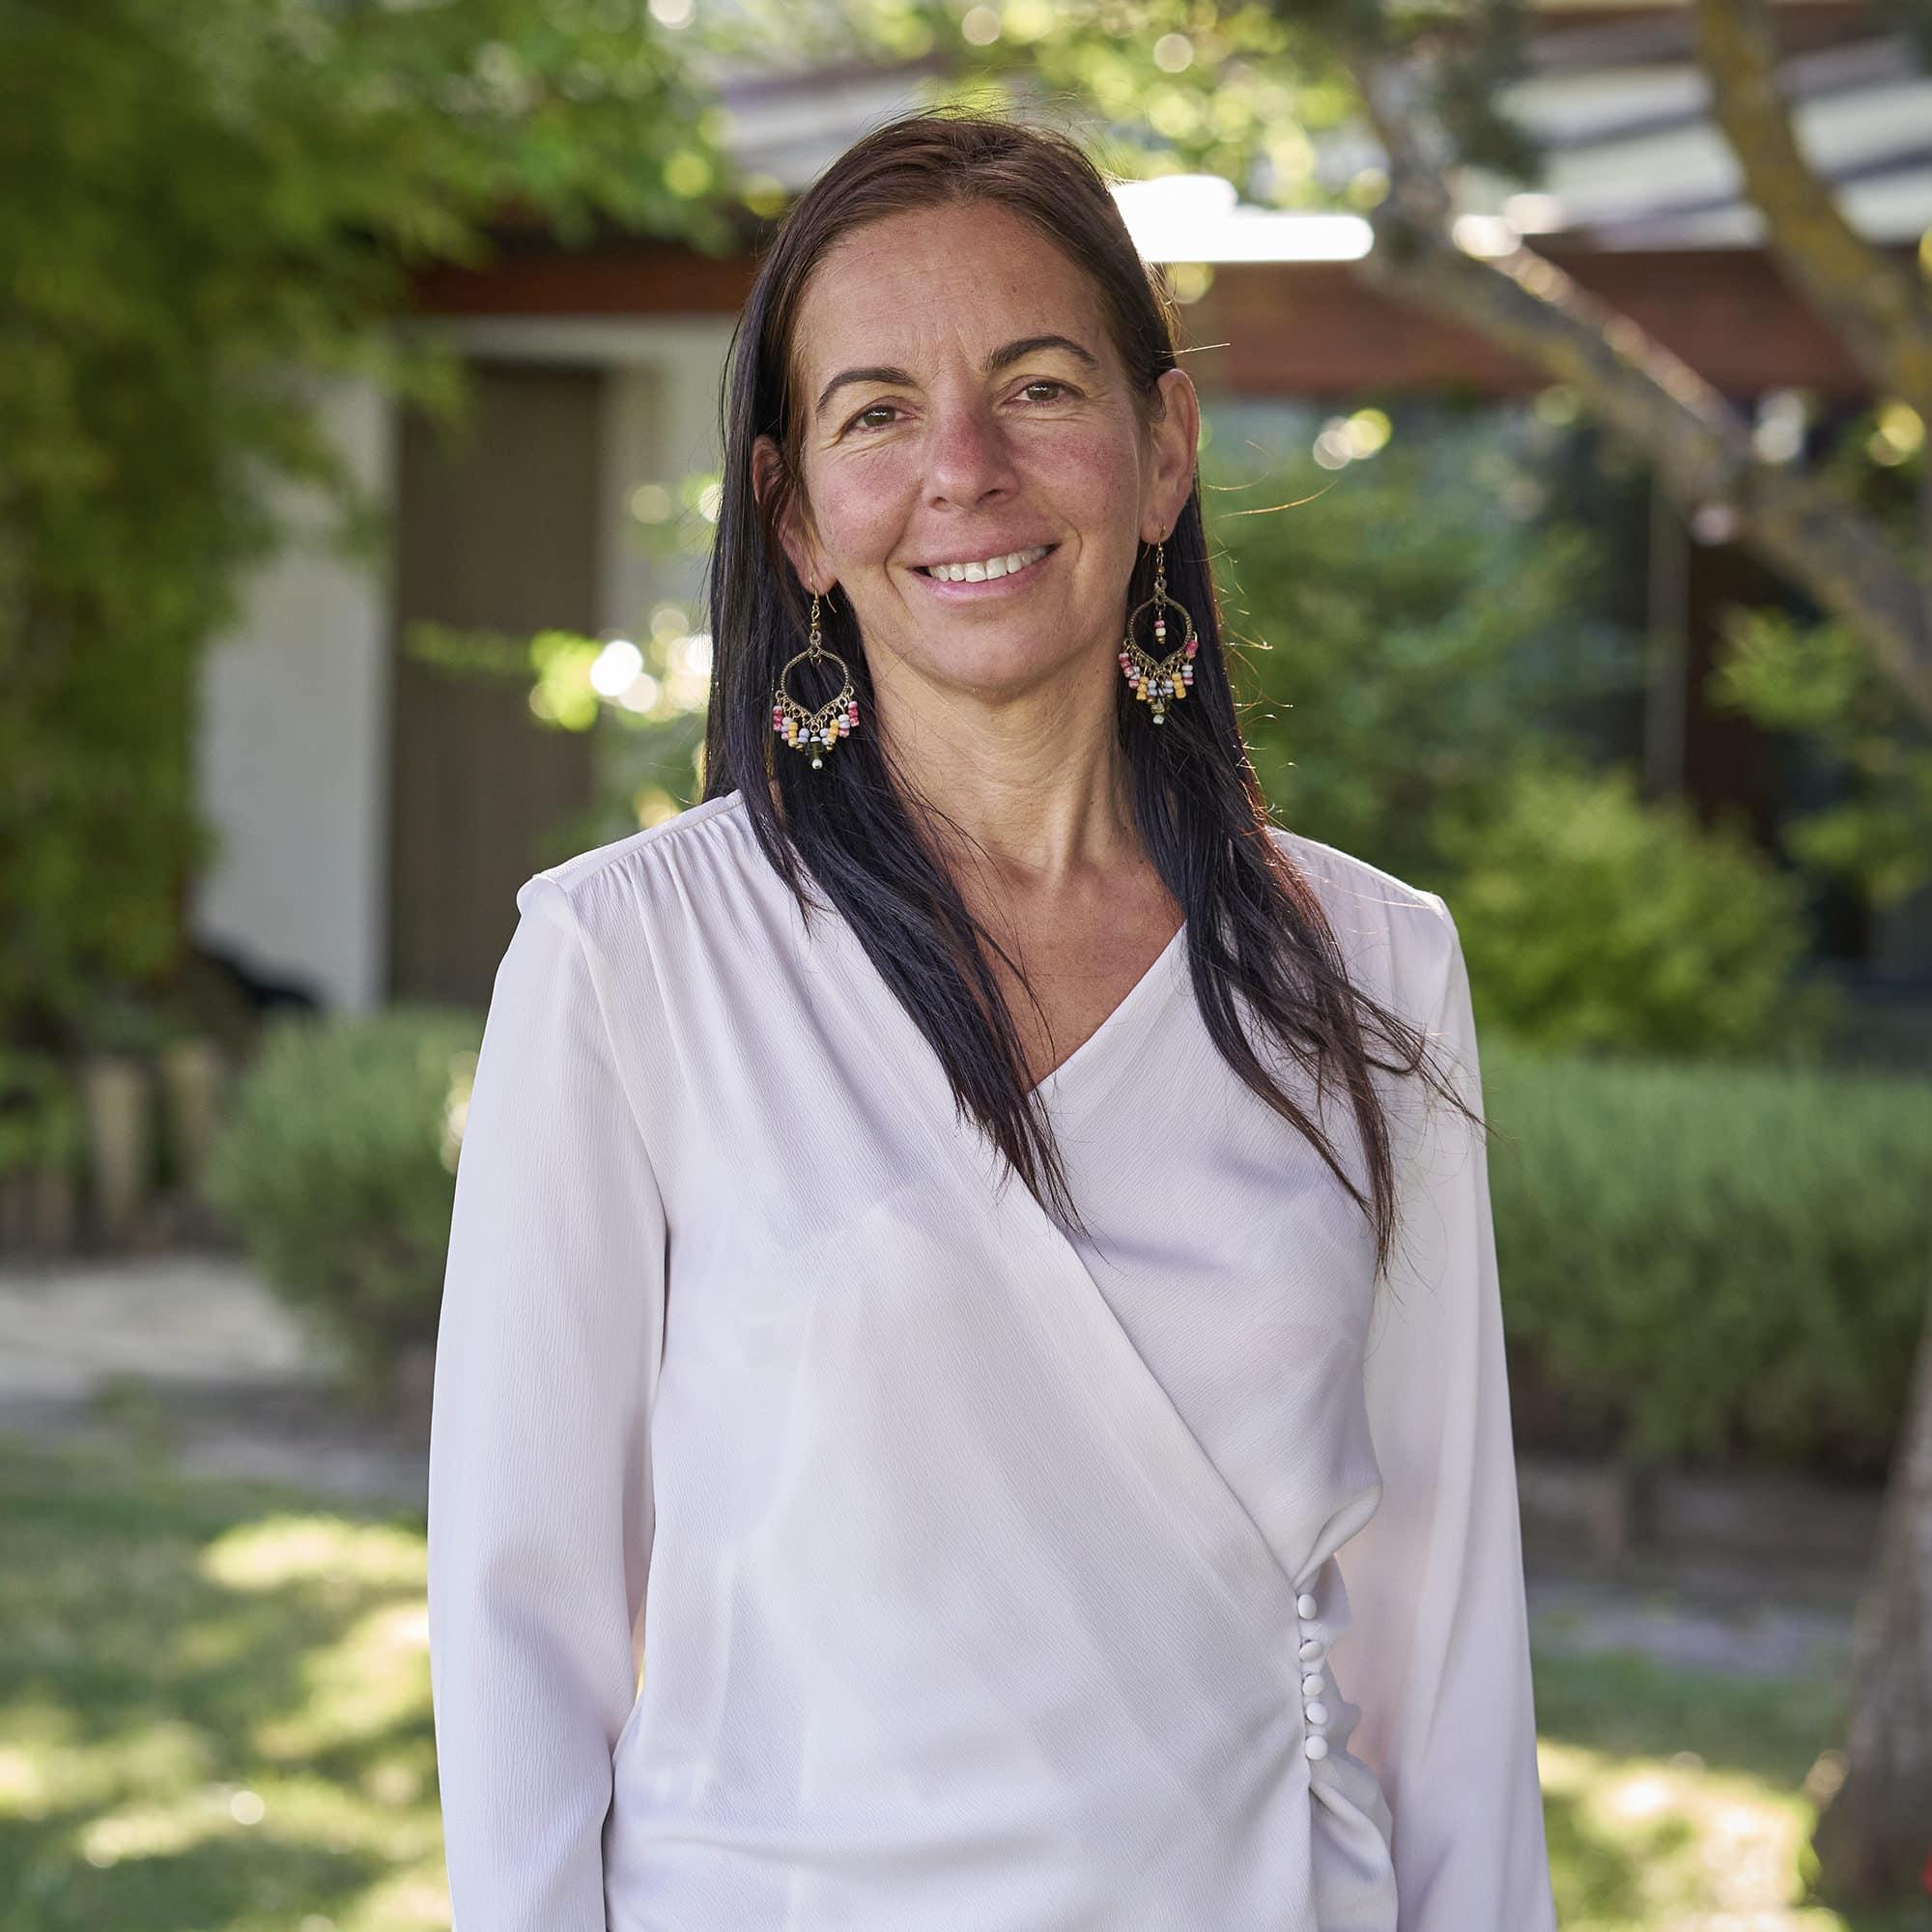 Amalia Castro Menéndez